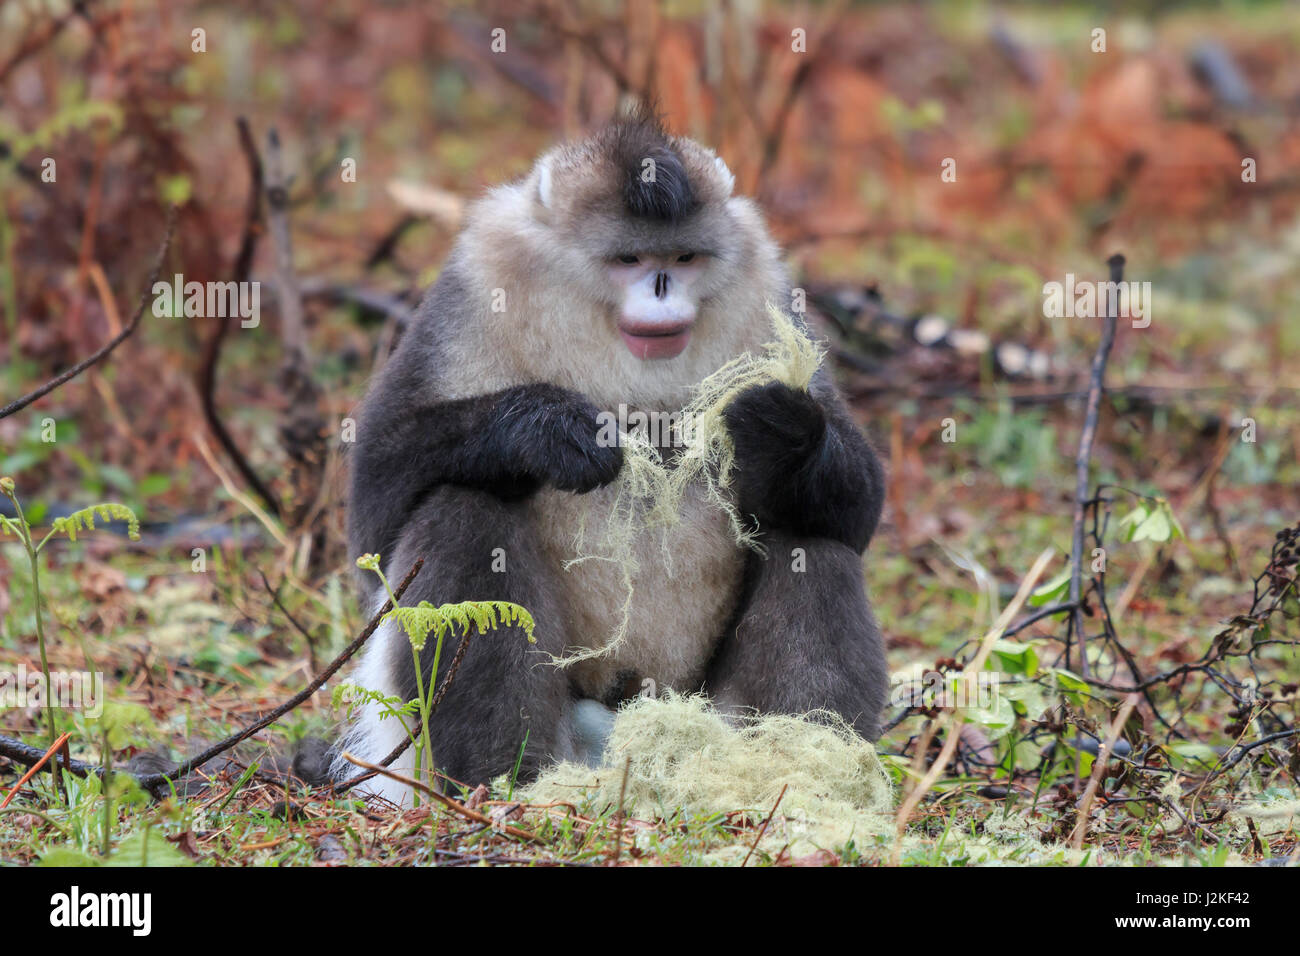 Yunnan Black Snub-Nosed Monkey (Rhinopithecus Bieti) - Stock Image